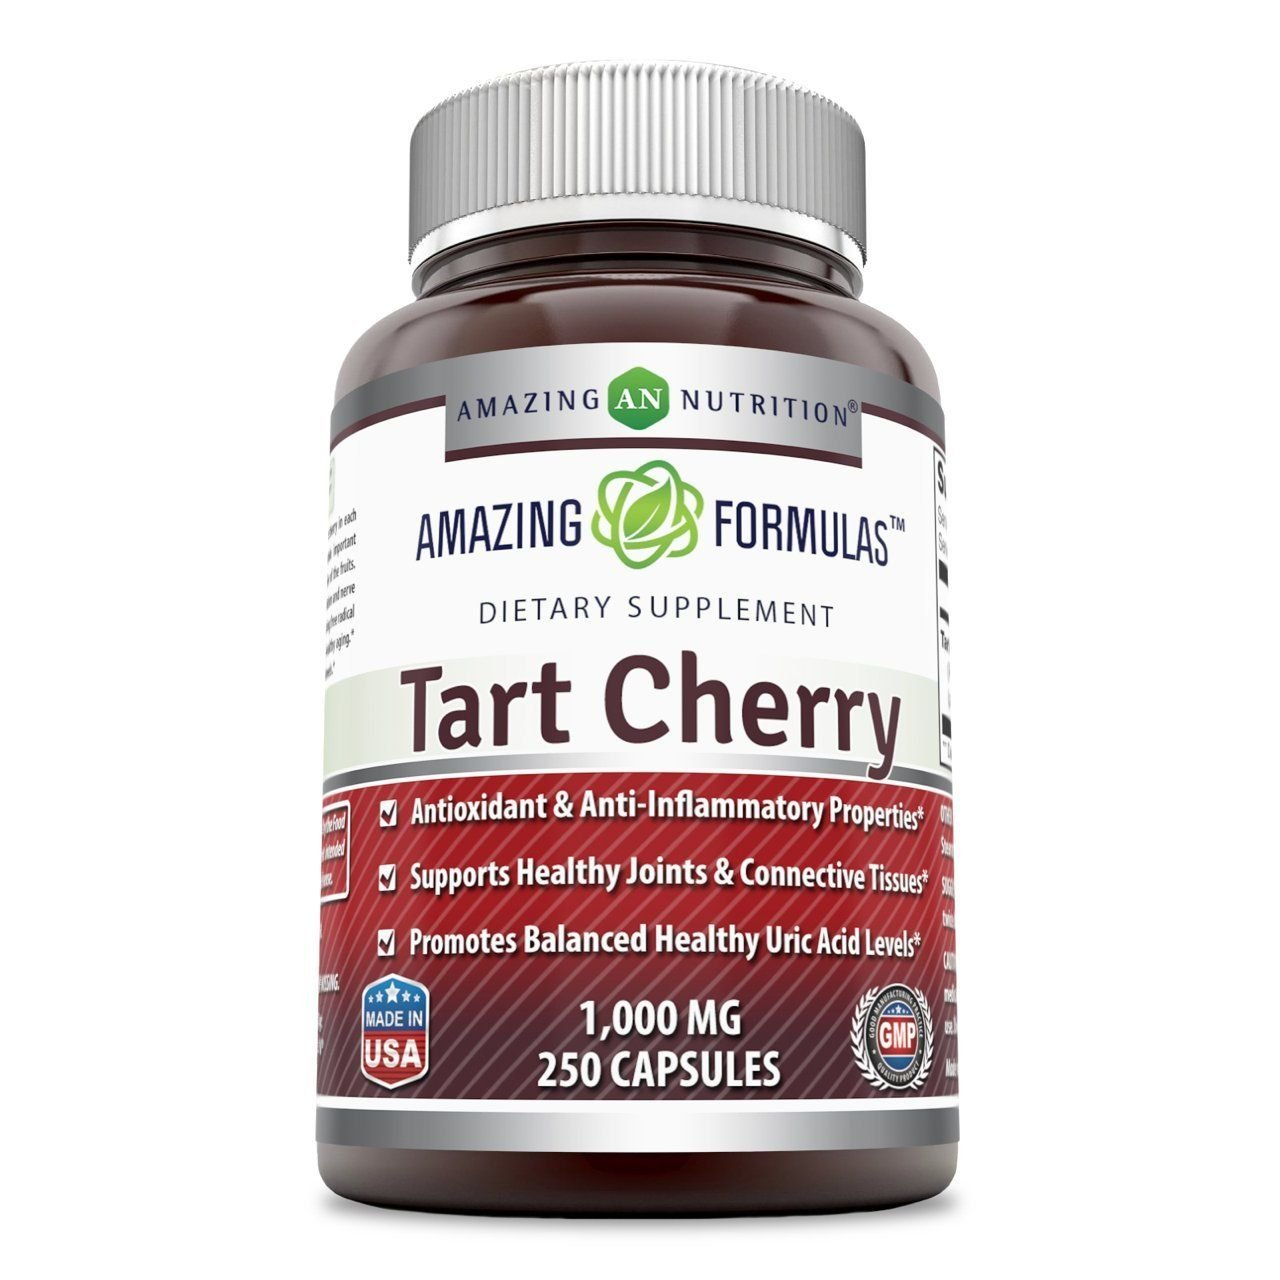 Amazing Formulas Tart Cherry Extract - 1000 Mg, 250 Capsules Economy Size